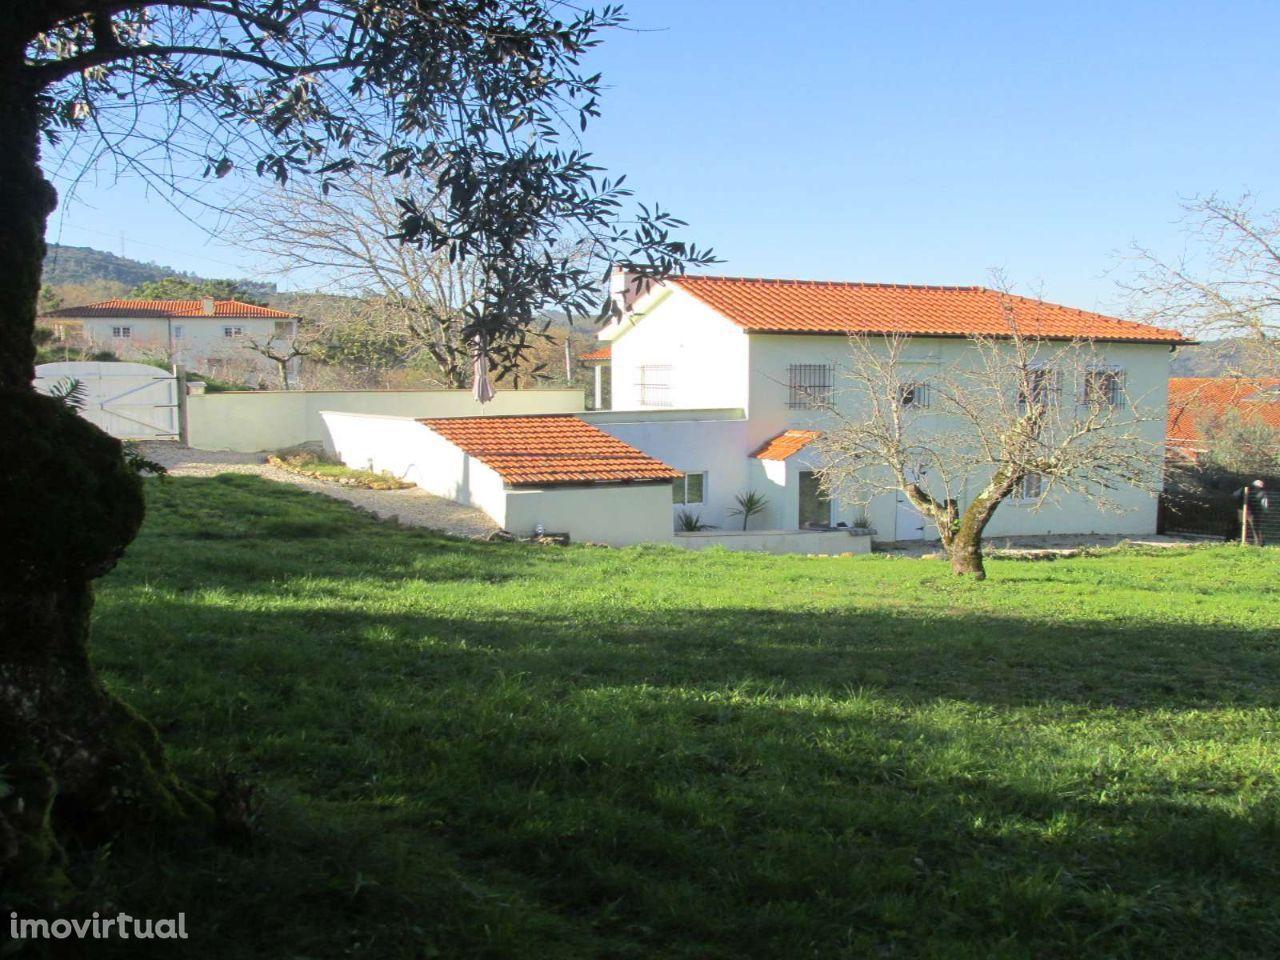 Detached 4 bedroom Cottage with Land near Penela